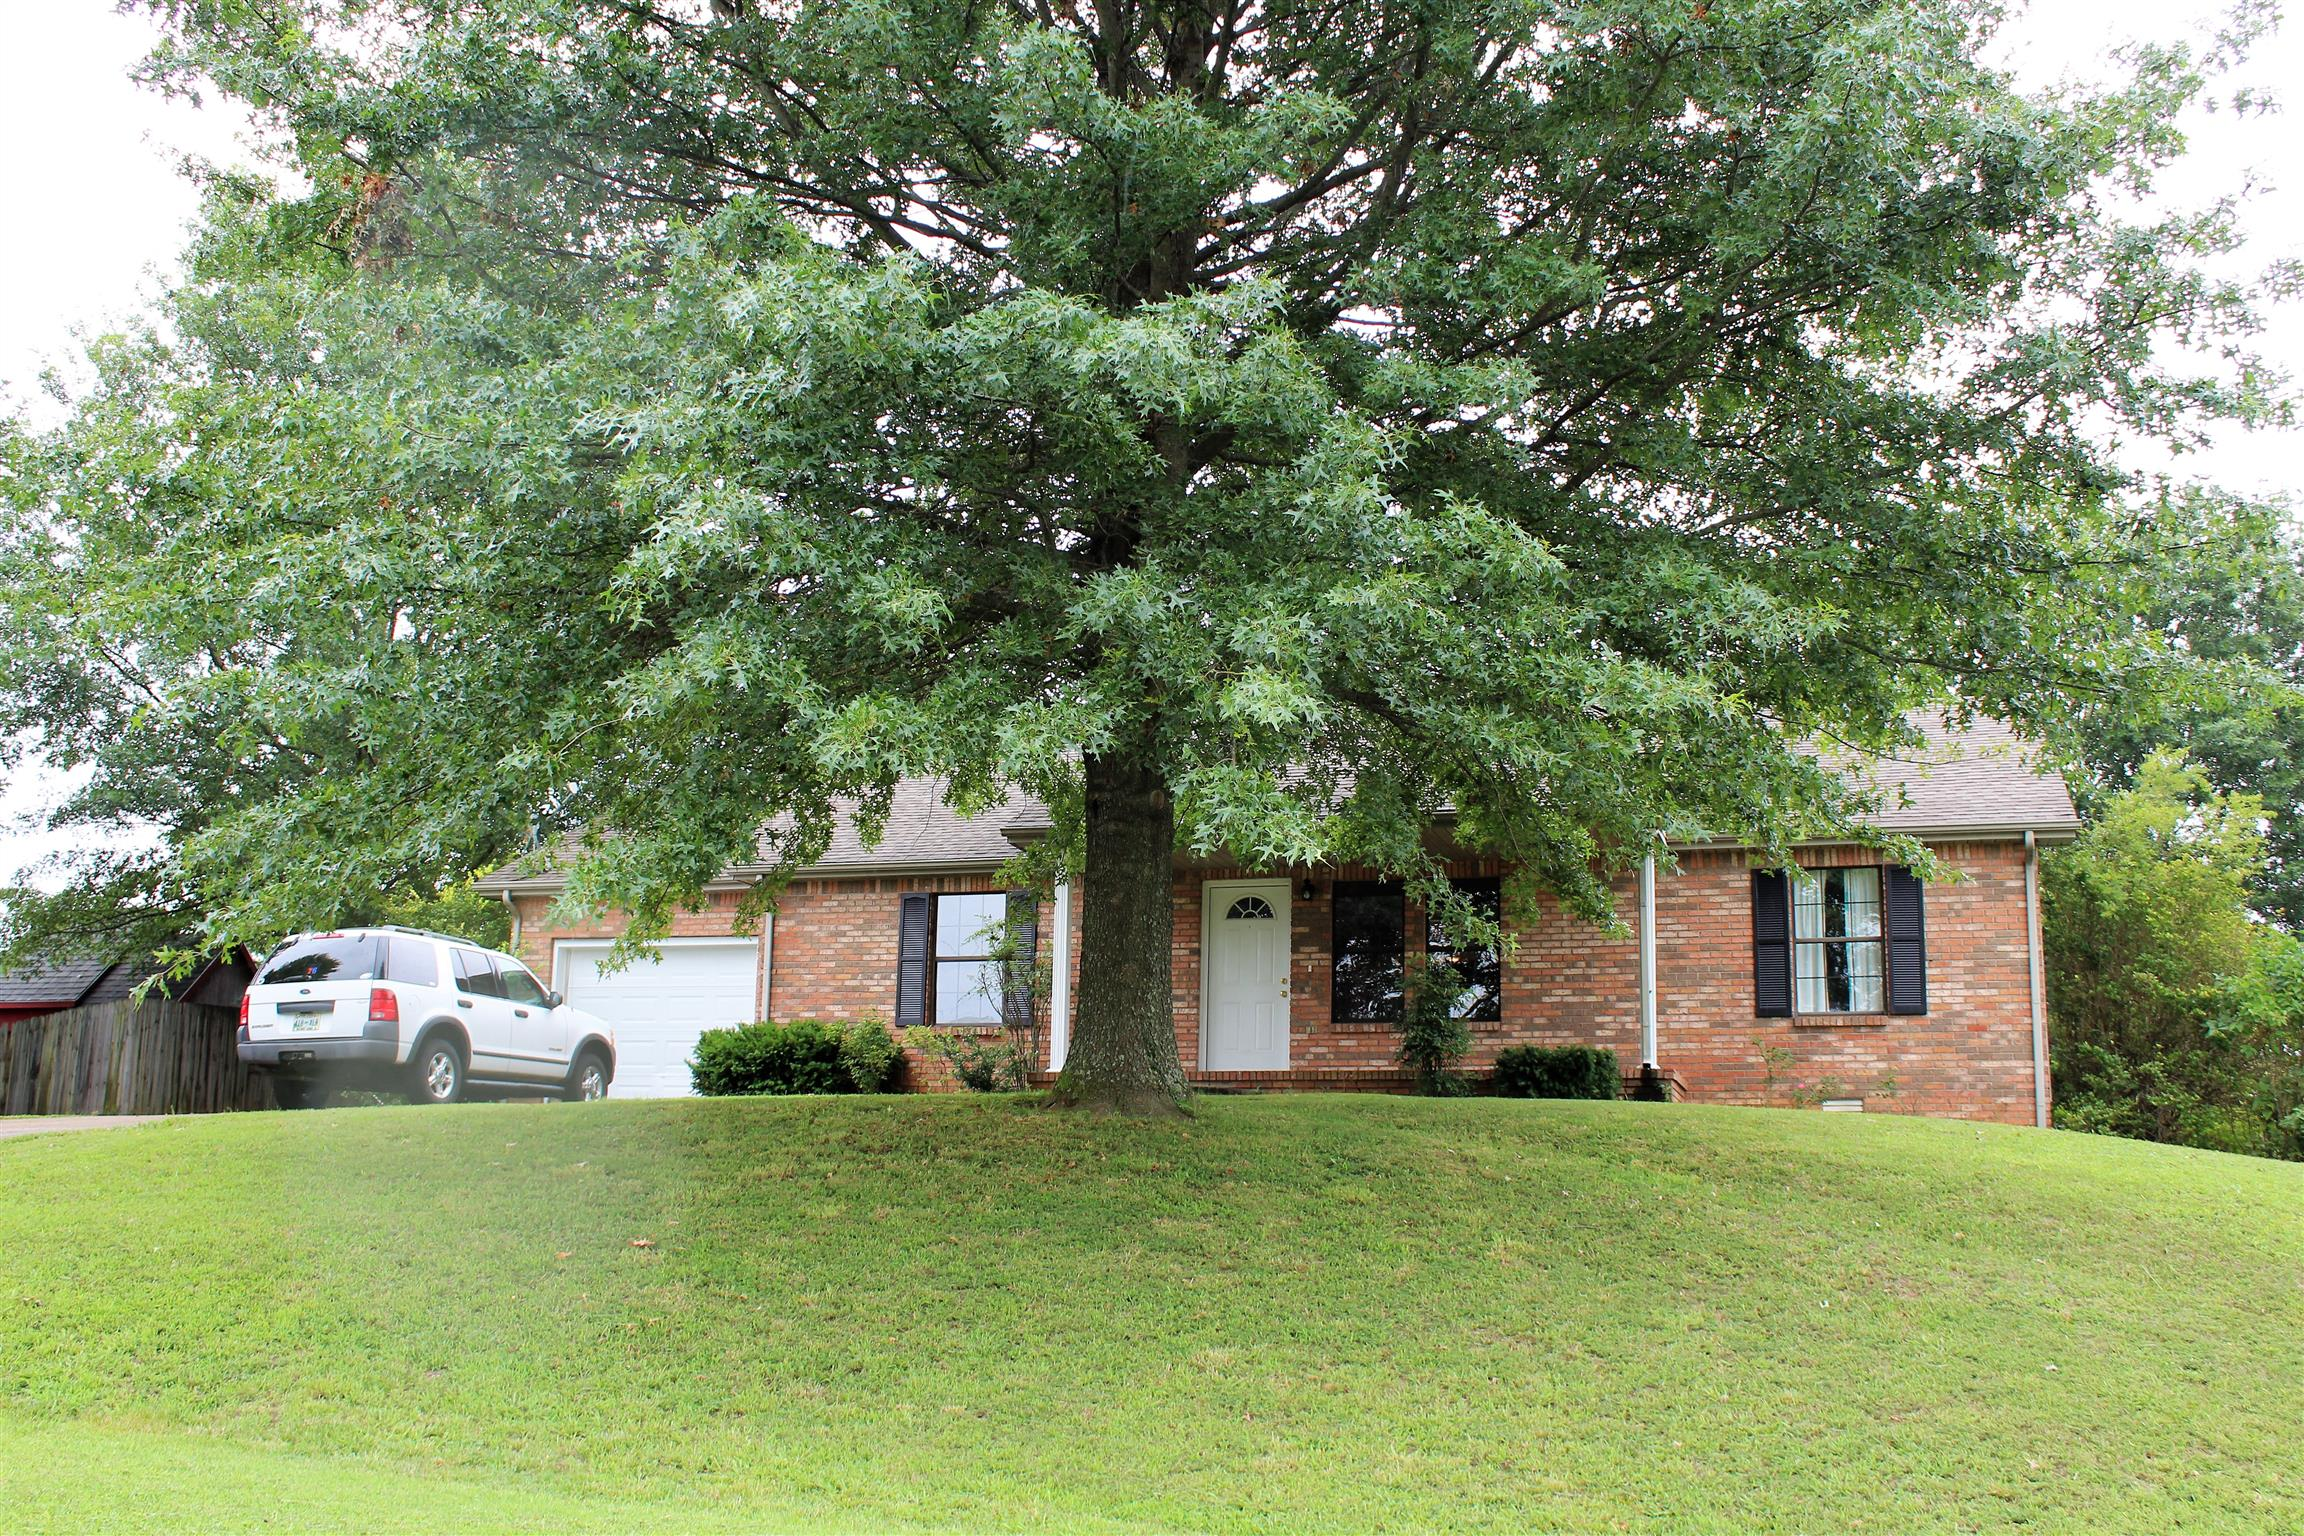 3372 Brownsville Rd, Clarksville, TN 37043 - Clarksville, TN real estate listing